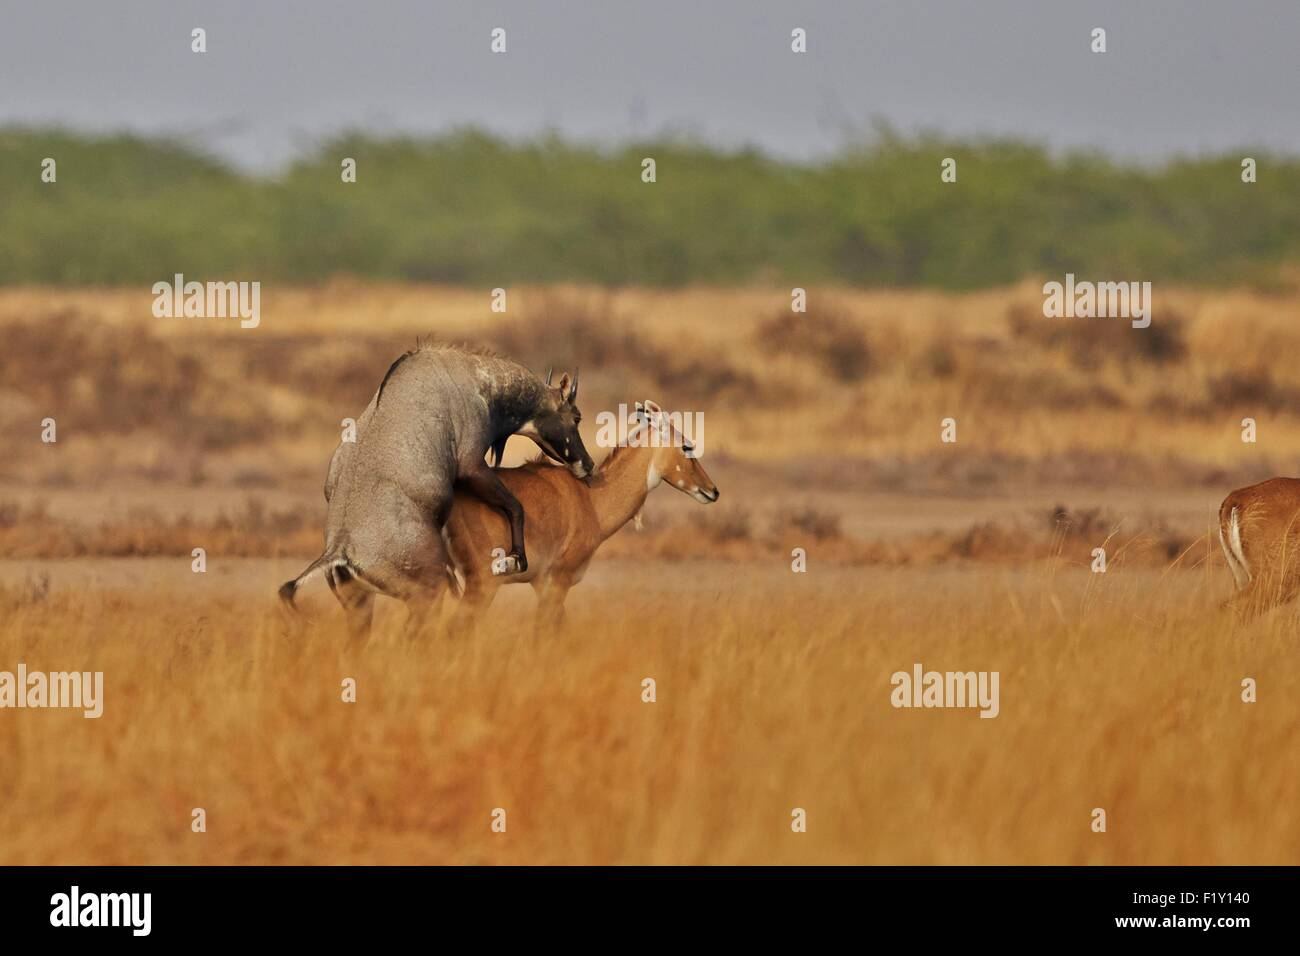 India, Gujarat state, Blackbuck national park, Nilgai or Indian Bull or Blue Antelope (Boselaphus tragocamelus), - Stock Image